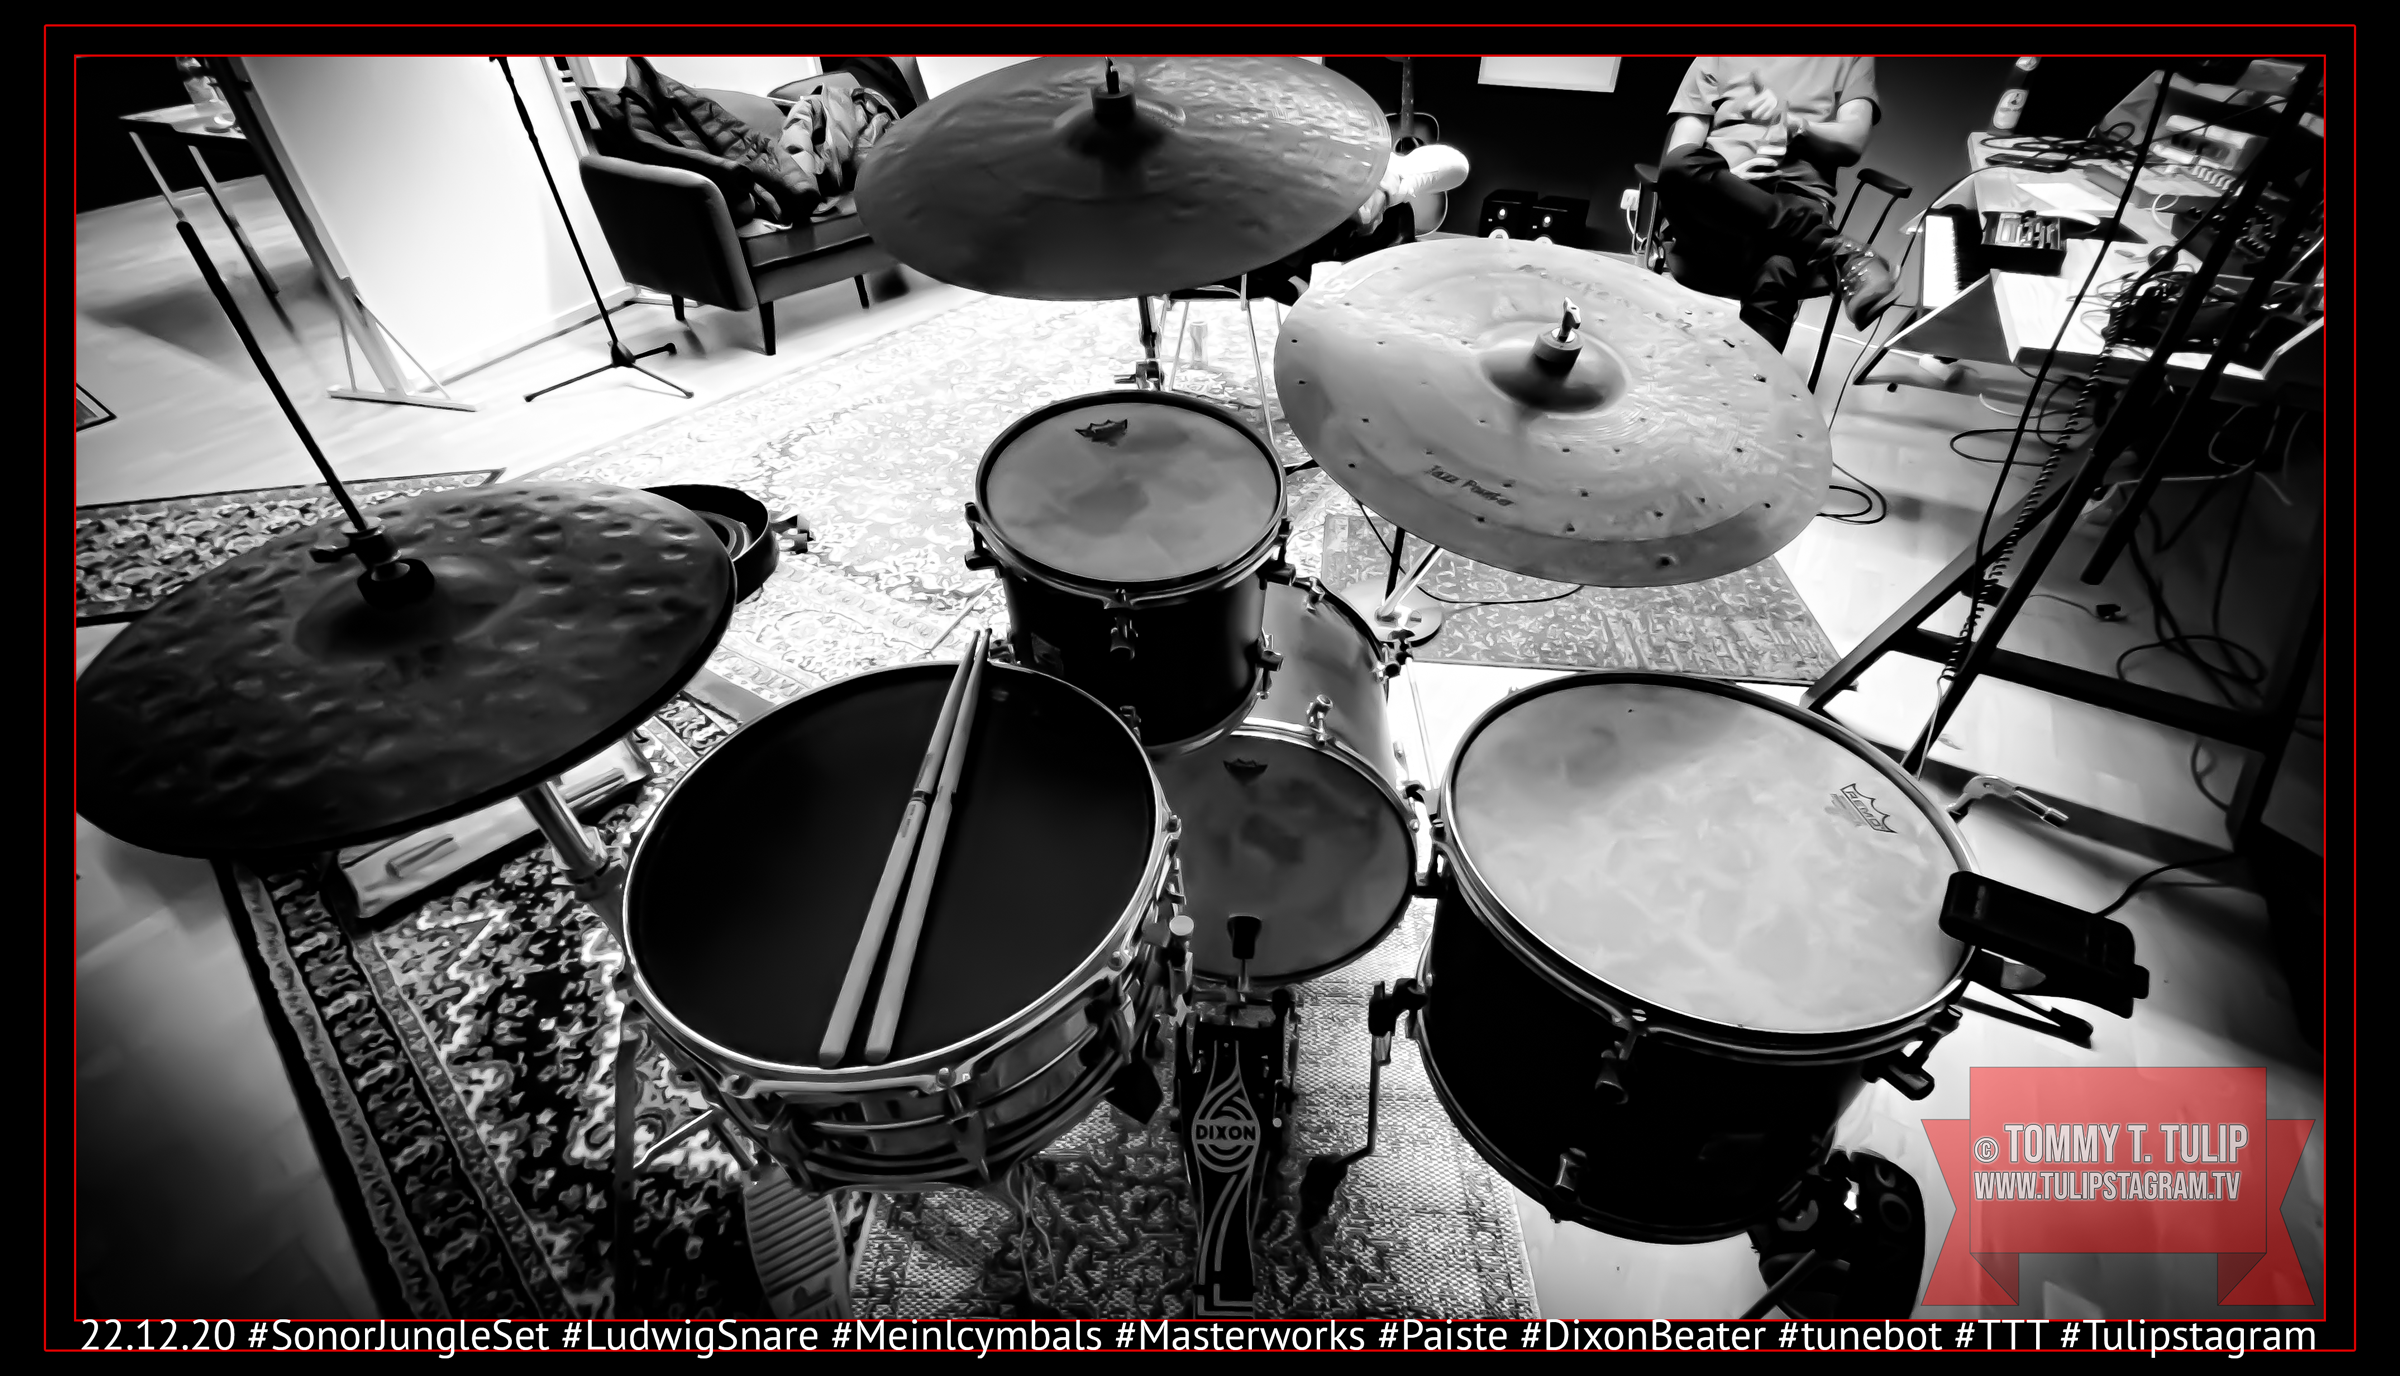 22.12.20 Drum Recordings #SonorJungleSet #LudwigSnare #Meinlcymbals #Masterworks #Paiste #Dixonbeater #tunebot #TTT #Tulipstagram